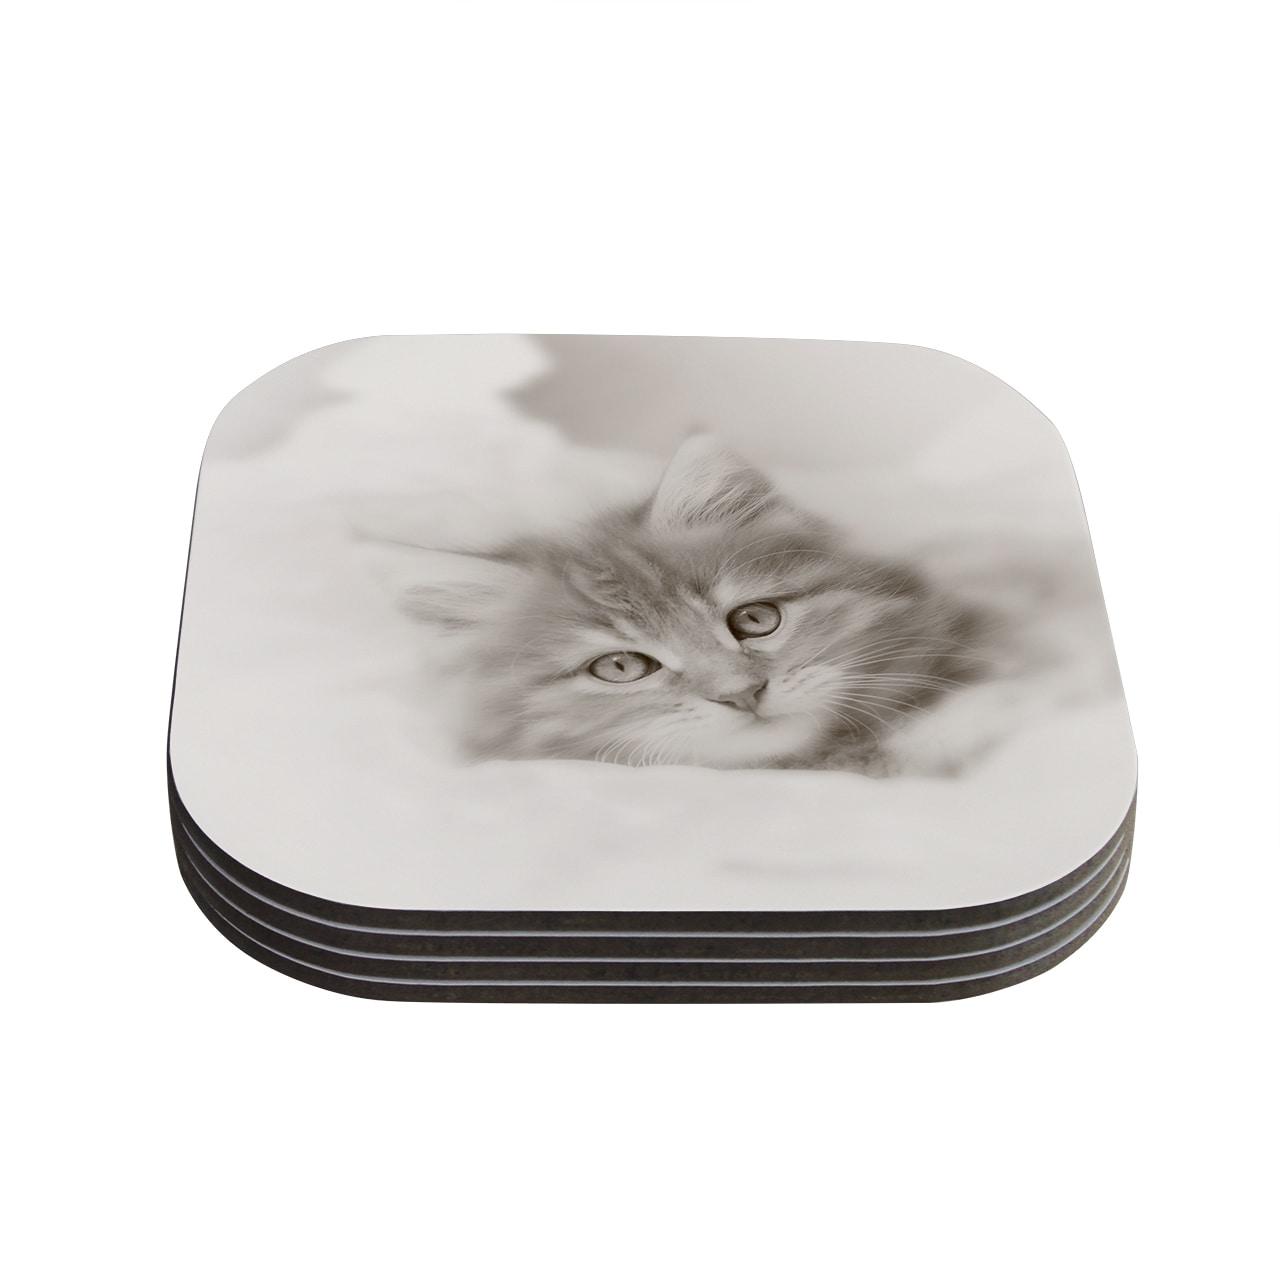 Kess InHouse Monika Strigel 'Main Coon Kitten' Gray Cat C...